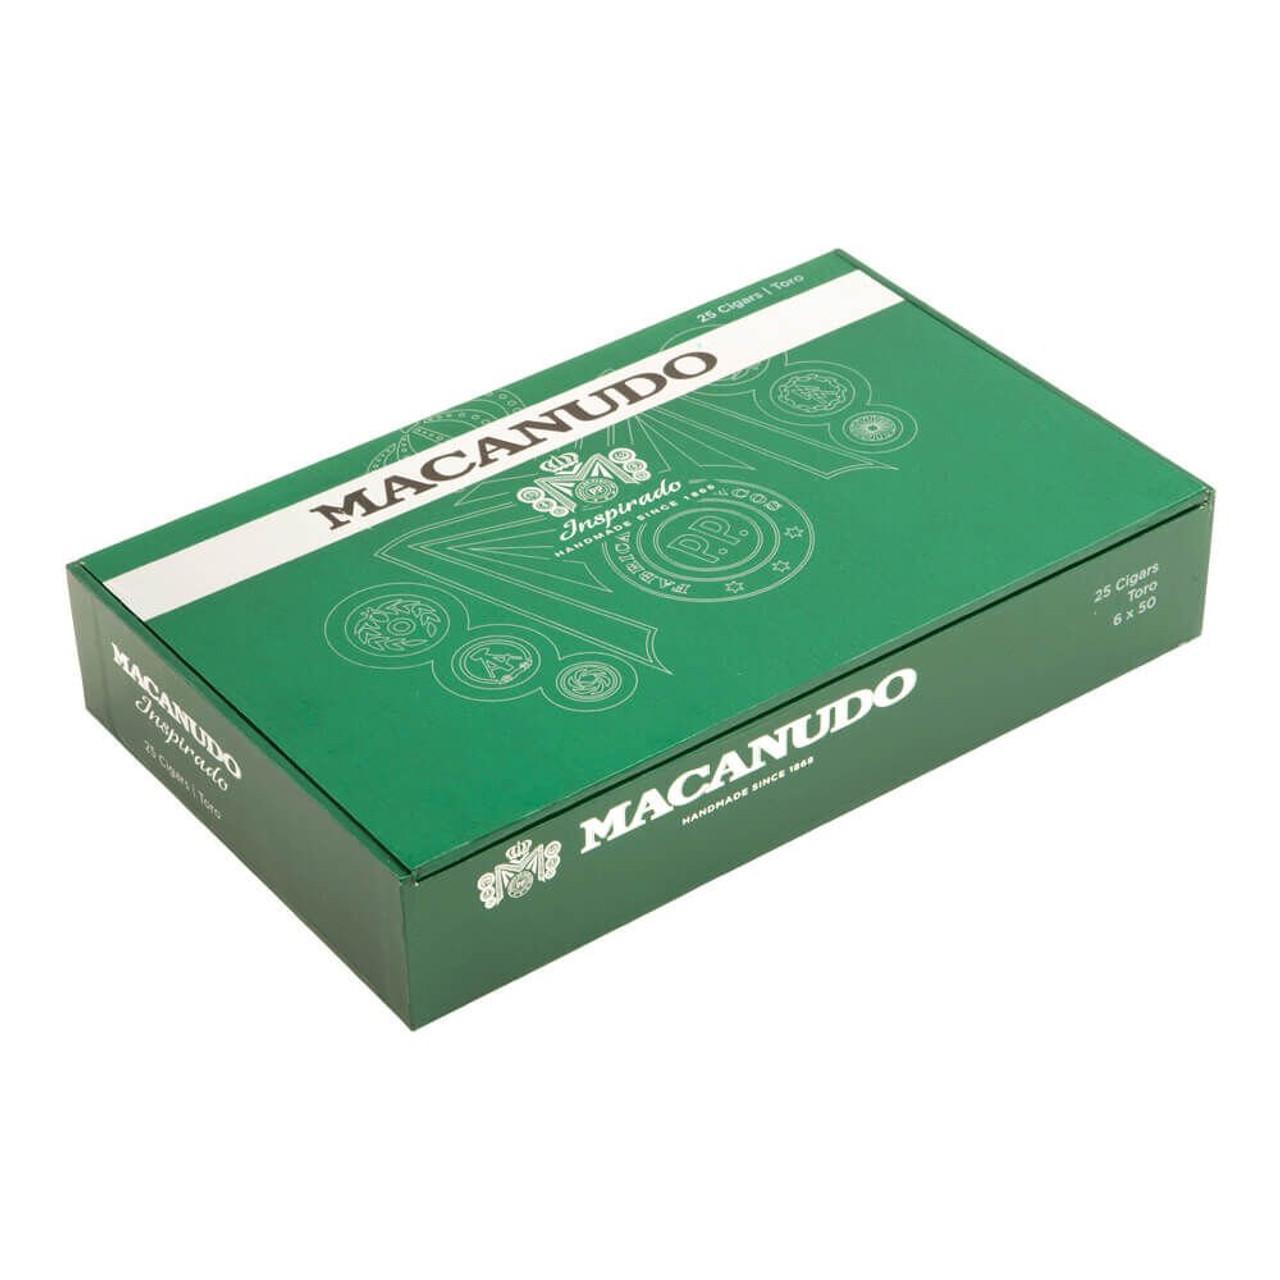 Macanudo Inspirado Green Robusto Cigars - 5.0 x 52 (Box of 25)